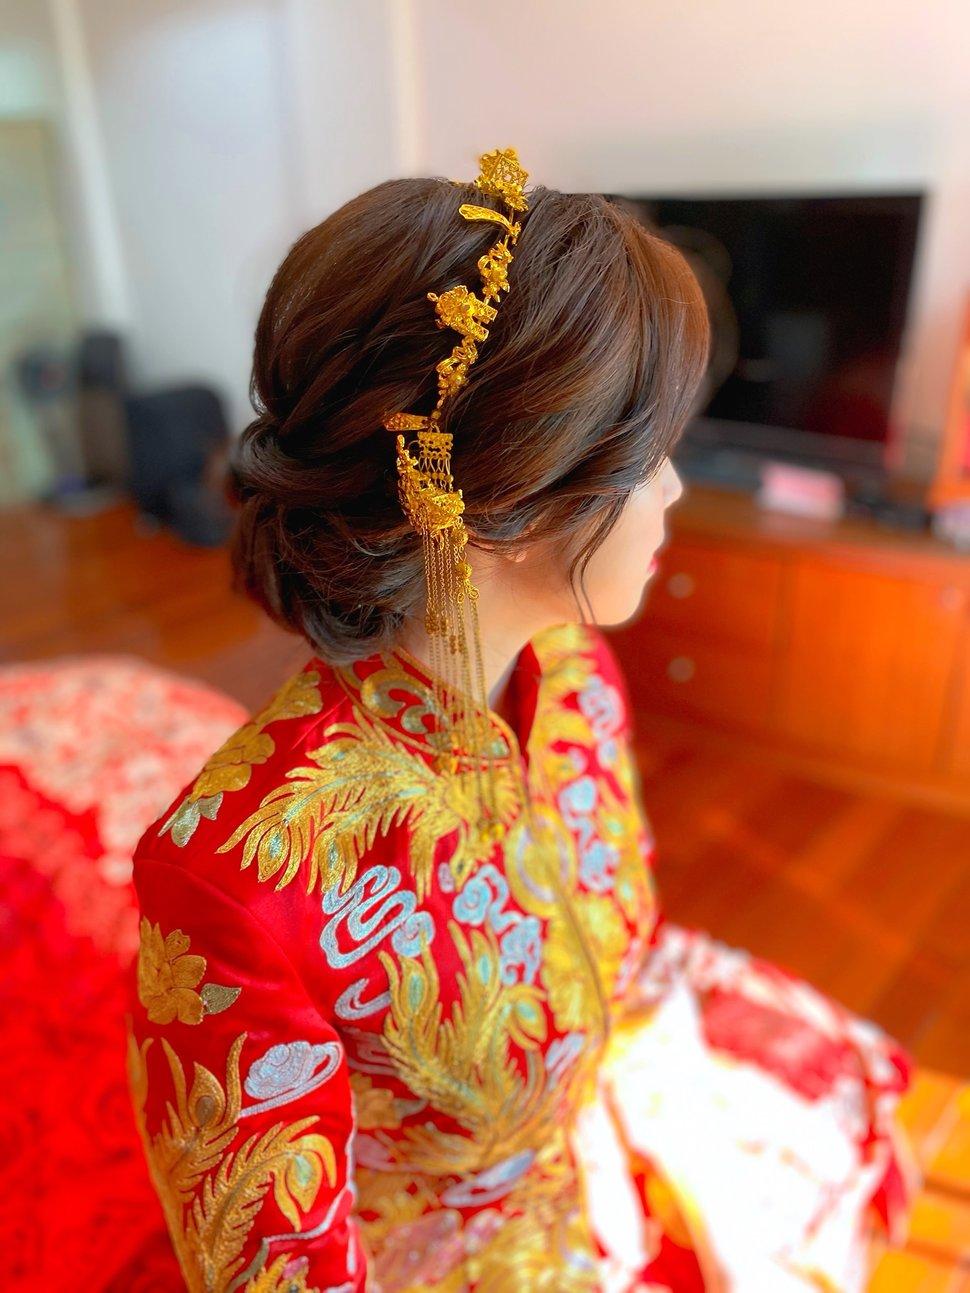 1FD94781-1FDA-48A4-9EE1-30965C3875C8 - 亞澐 Wedding 新娘秘書 整體彩妝《結婚吧》